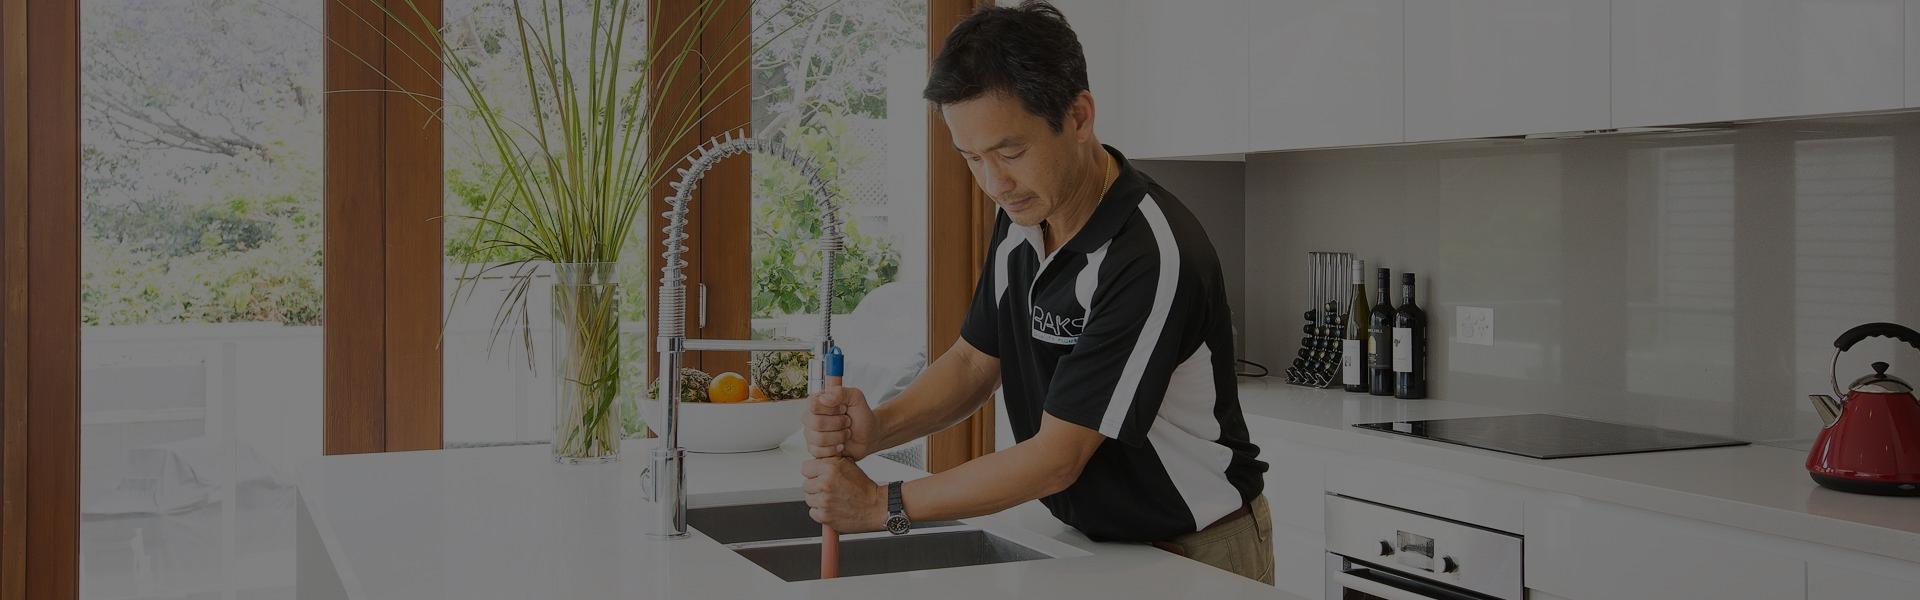 leaking tap repair sydney